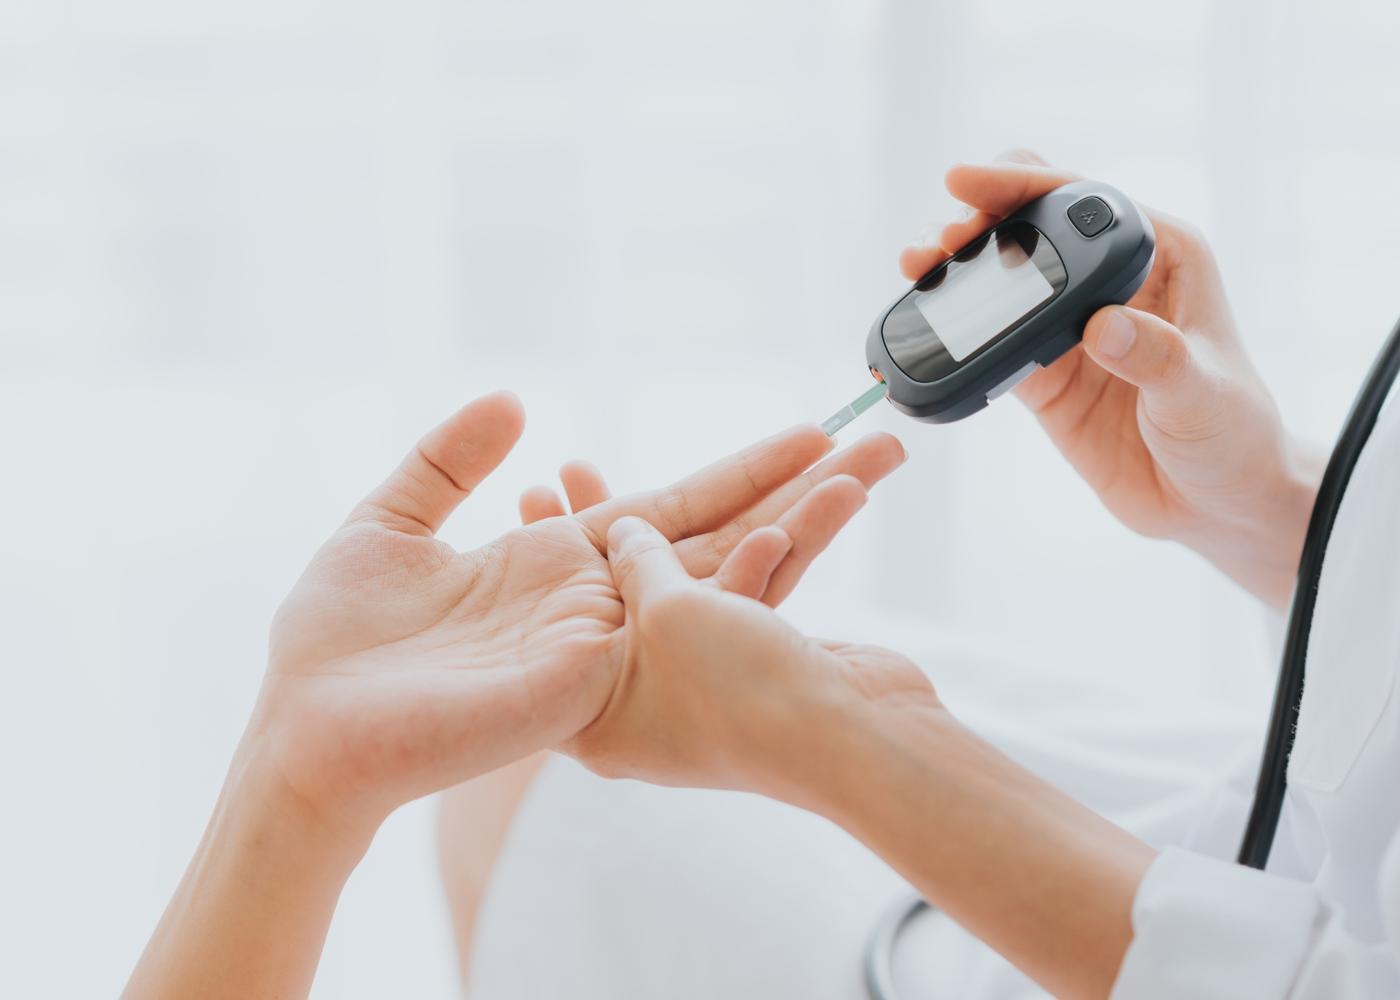 Médica a controlar glicemia de paciente